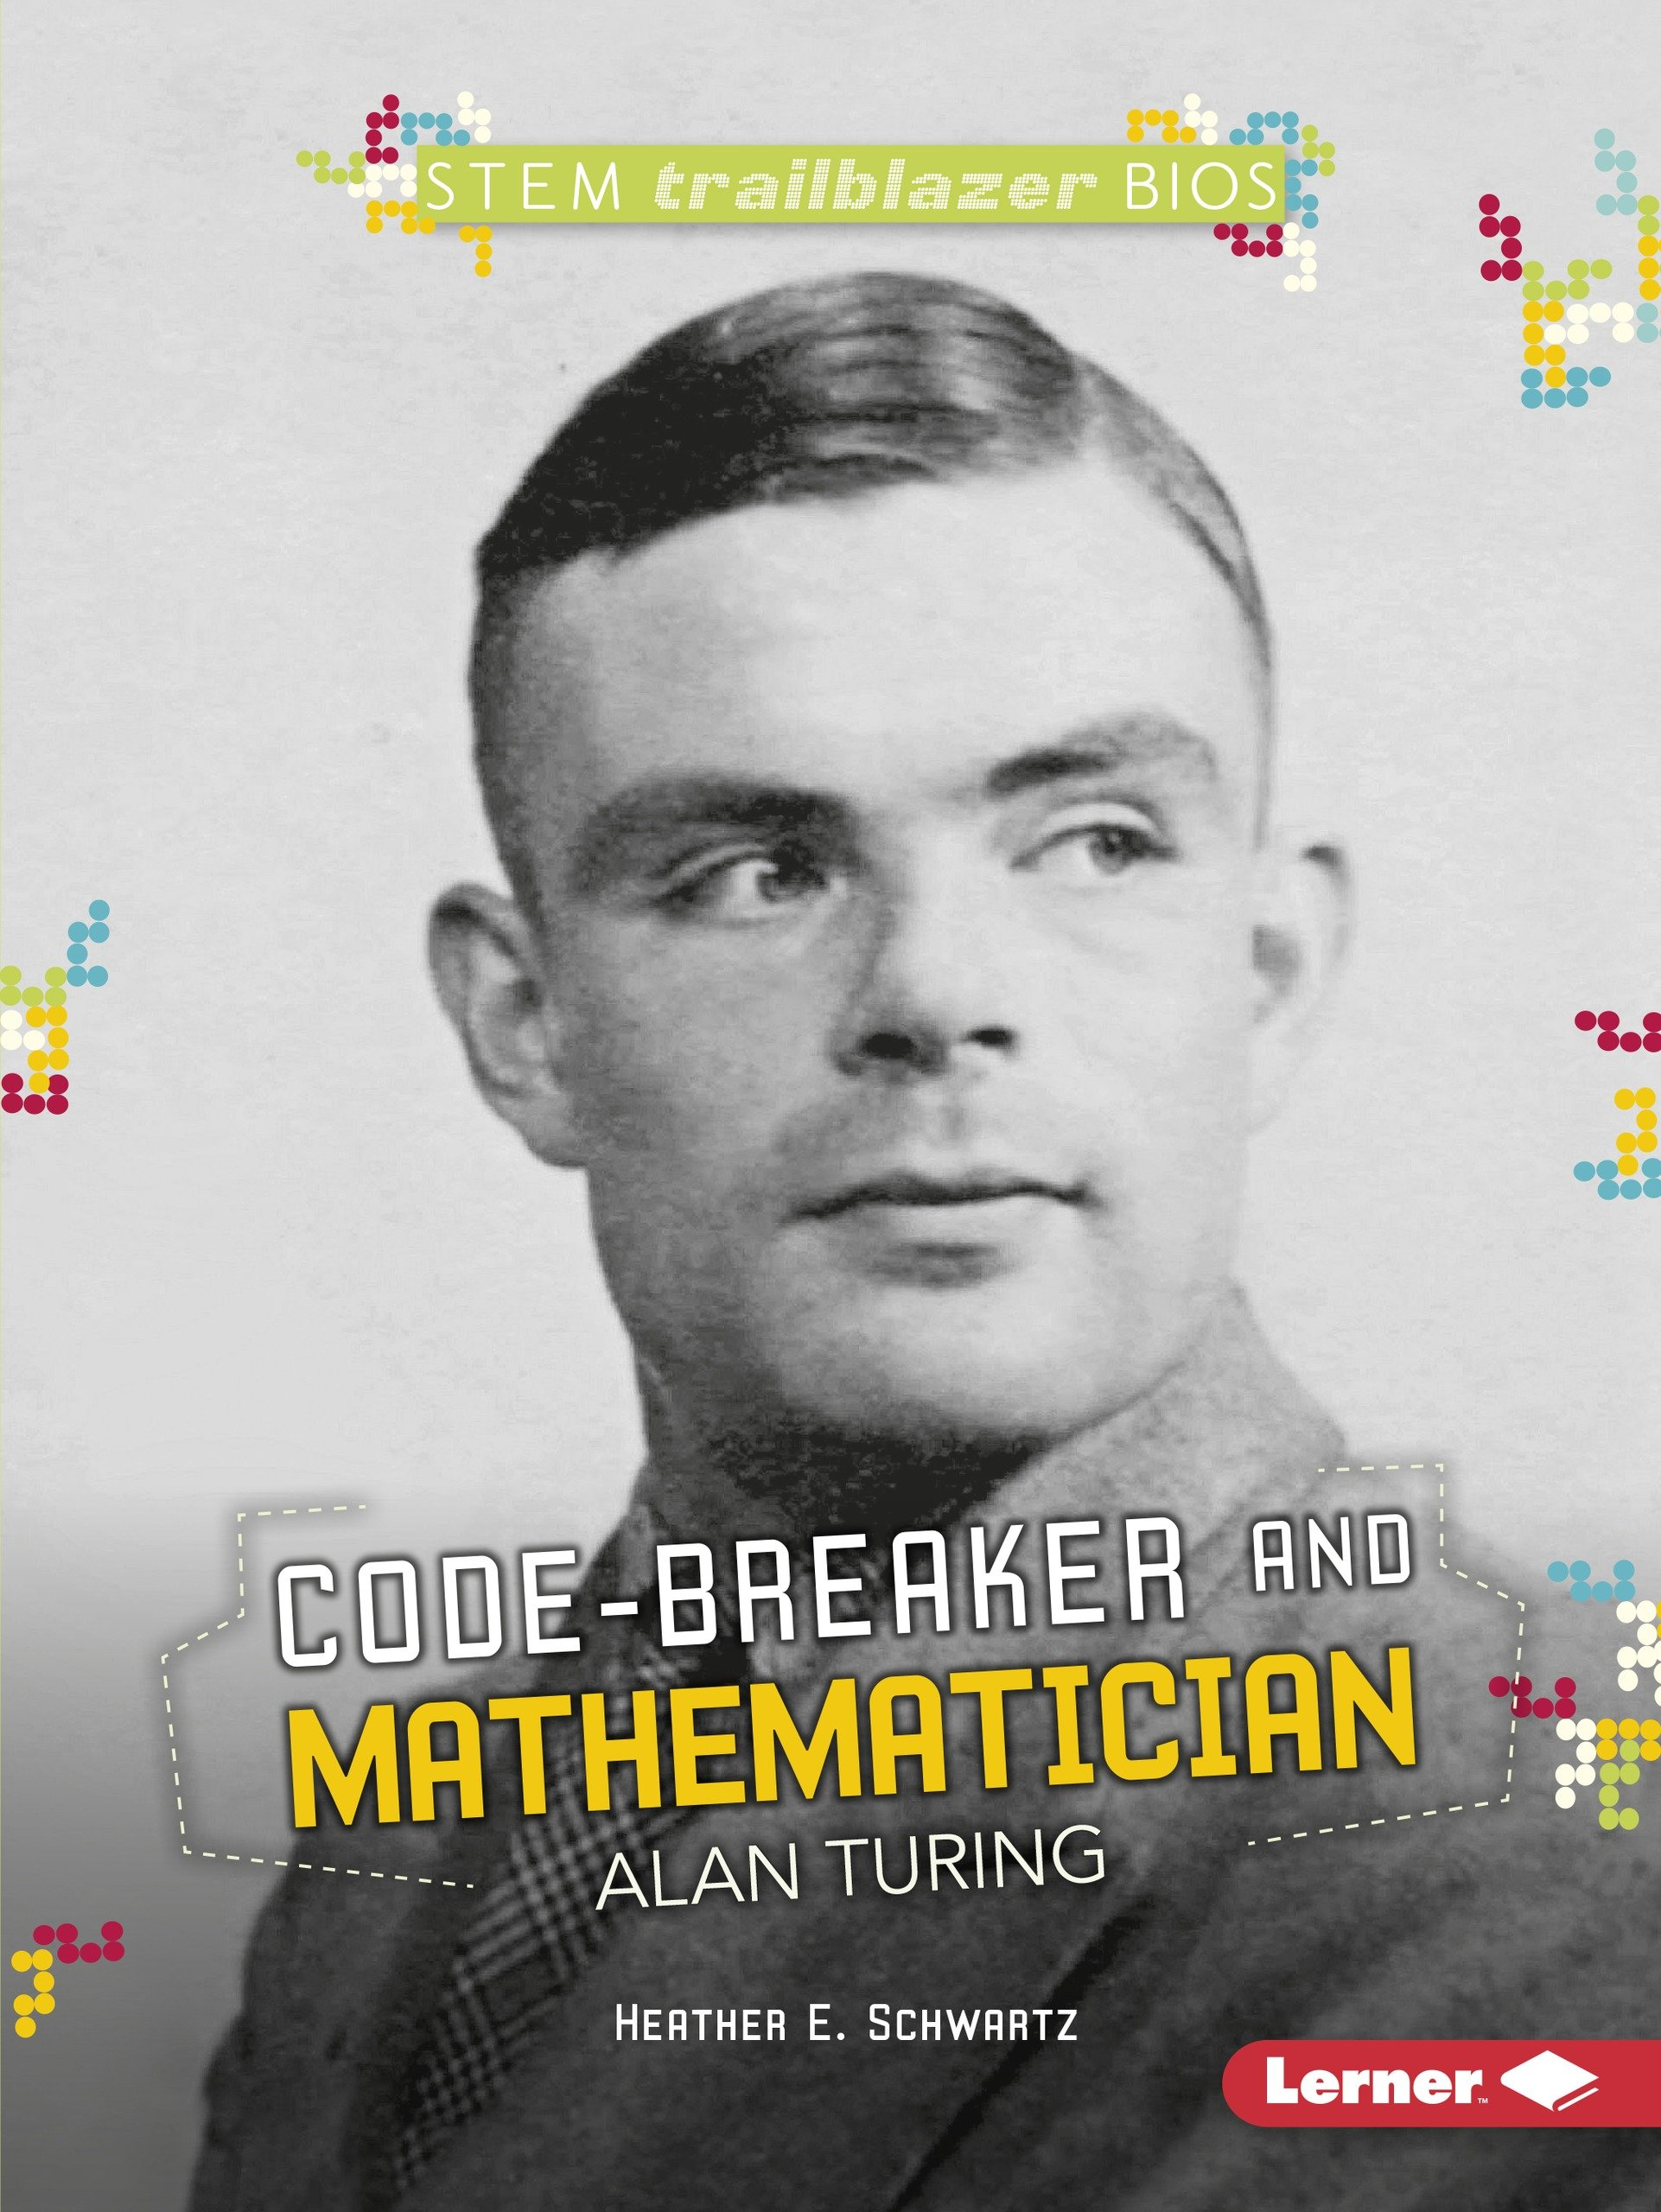 Download Code-Breaker and Mathematician Alan Turing (Stem Trailblazer Biographies) PDF